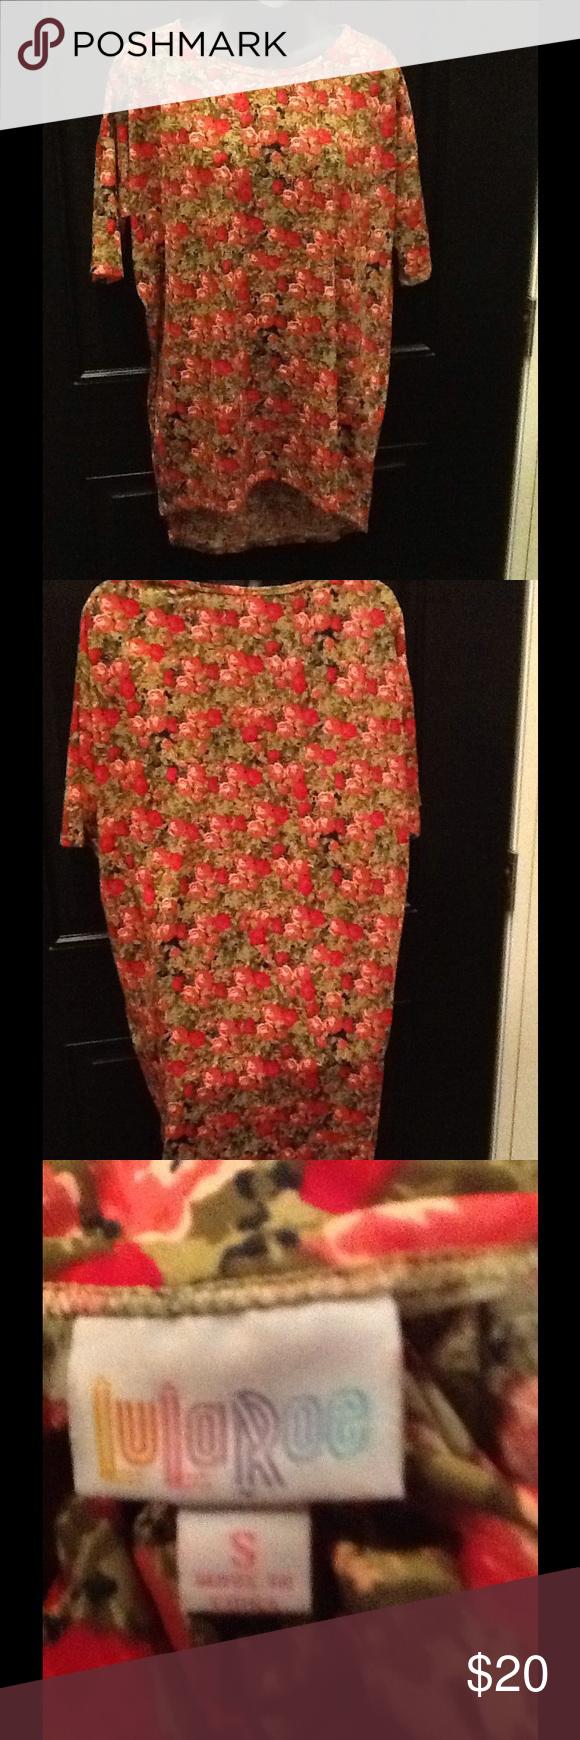 LuLaroe Irma size S Like new, never worn just tried on. LuLaRoe Tops Tunics